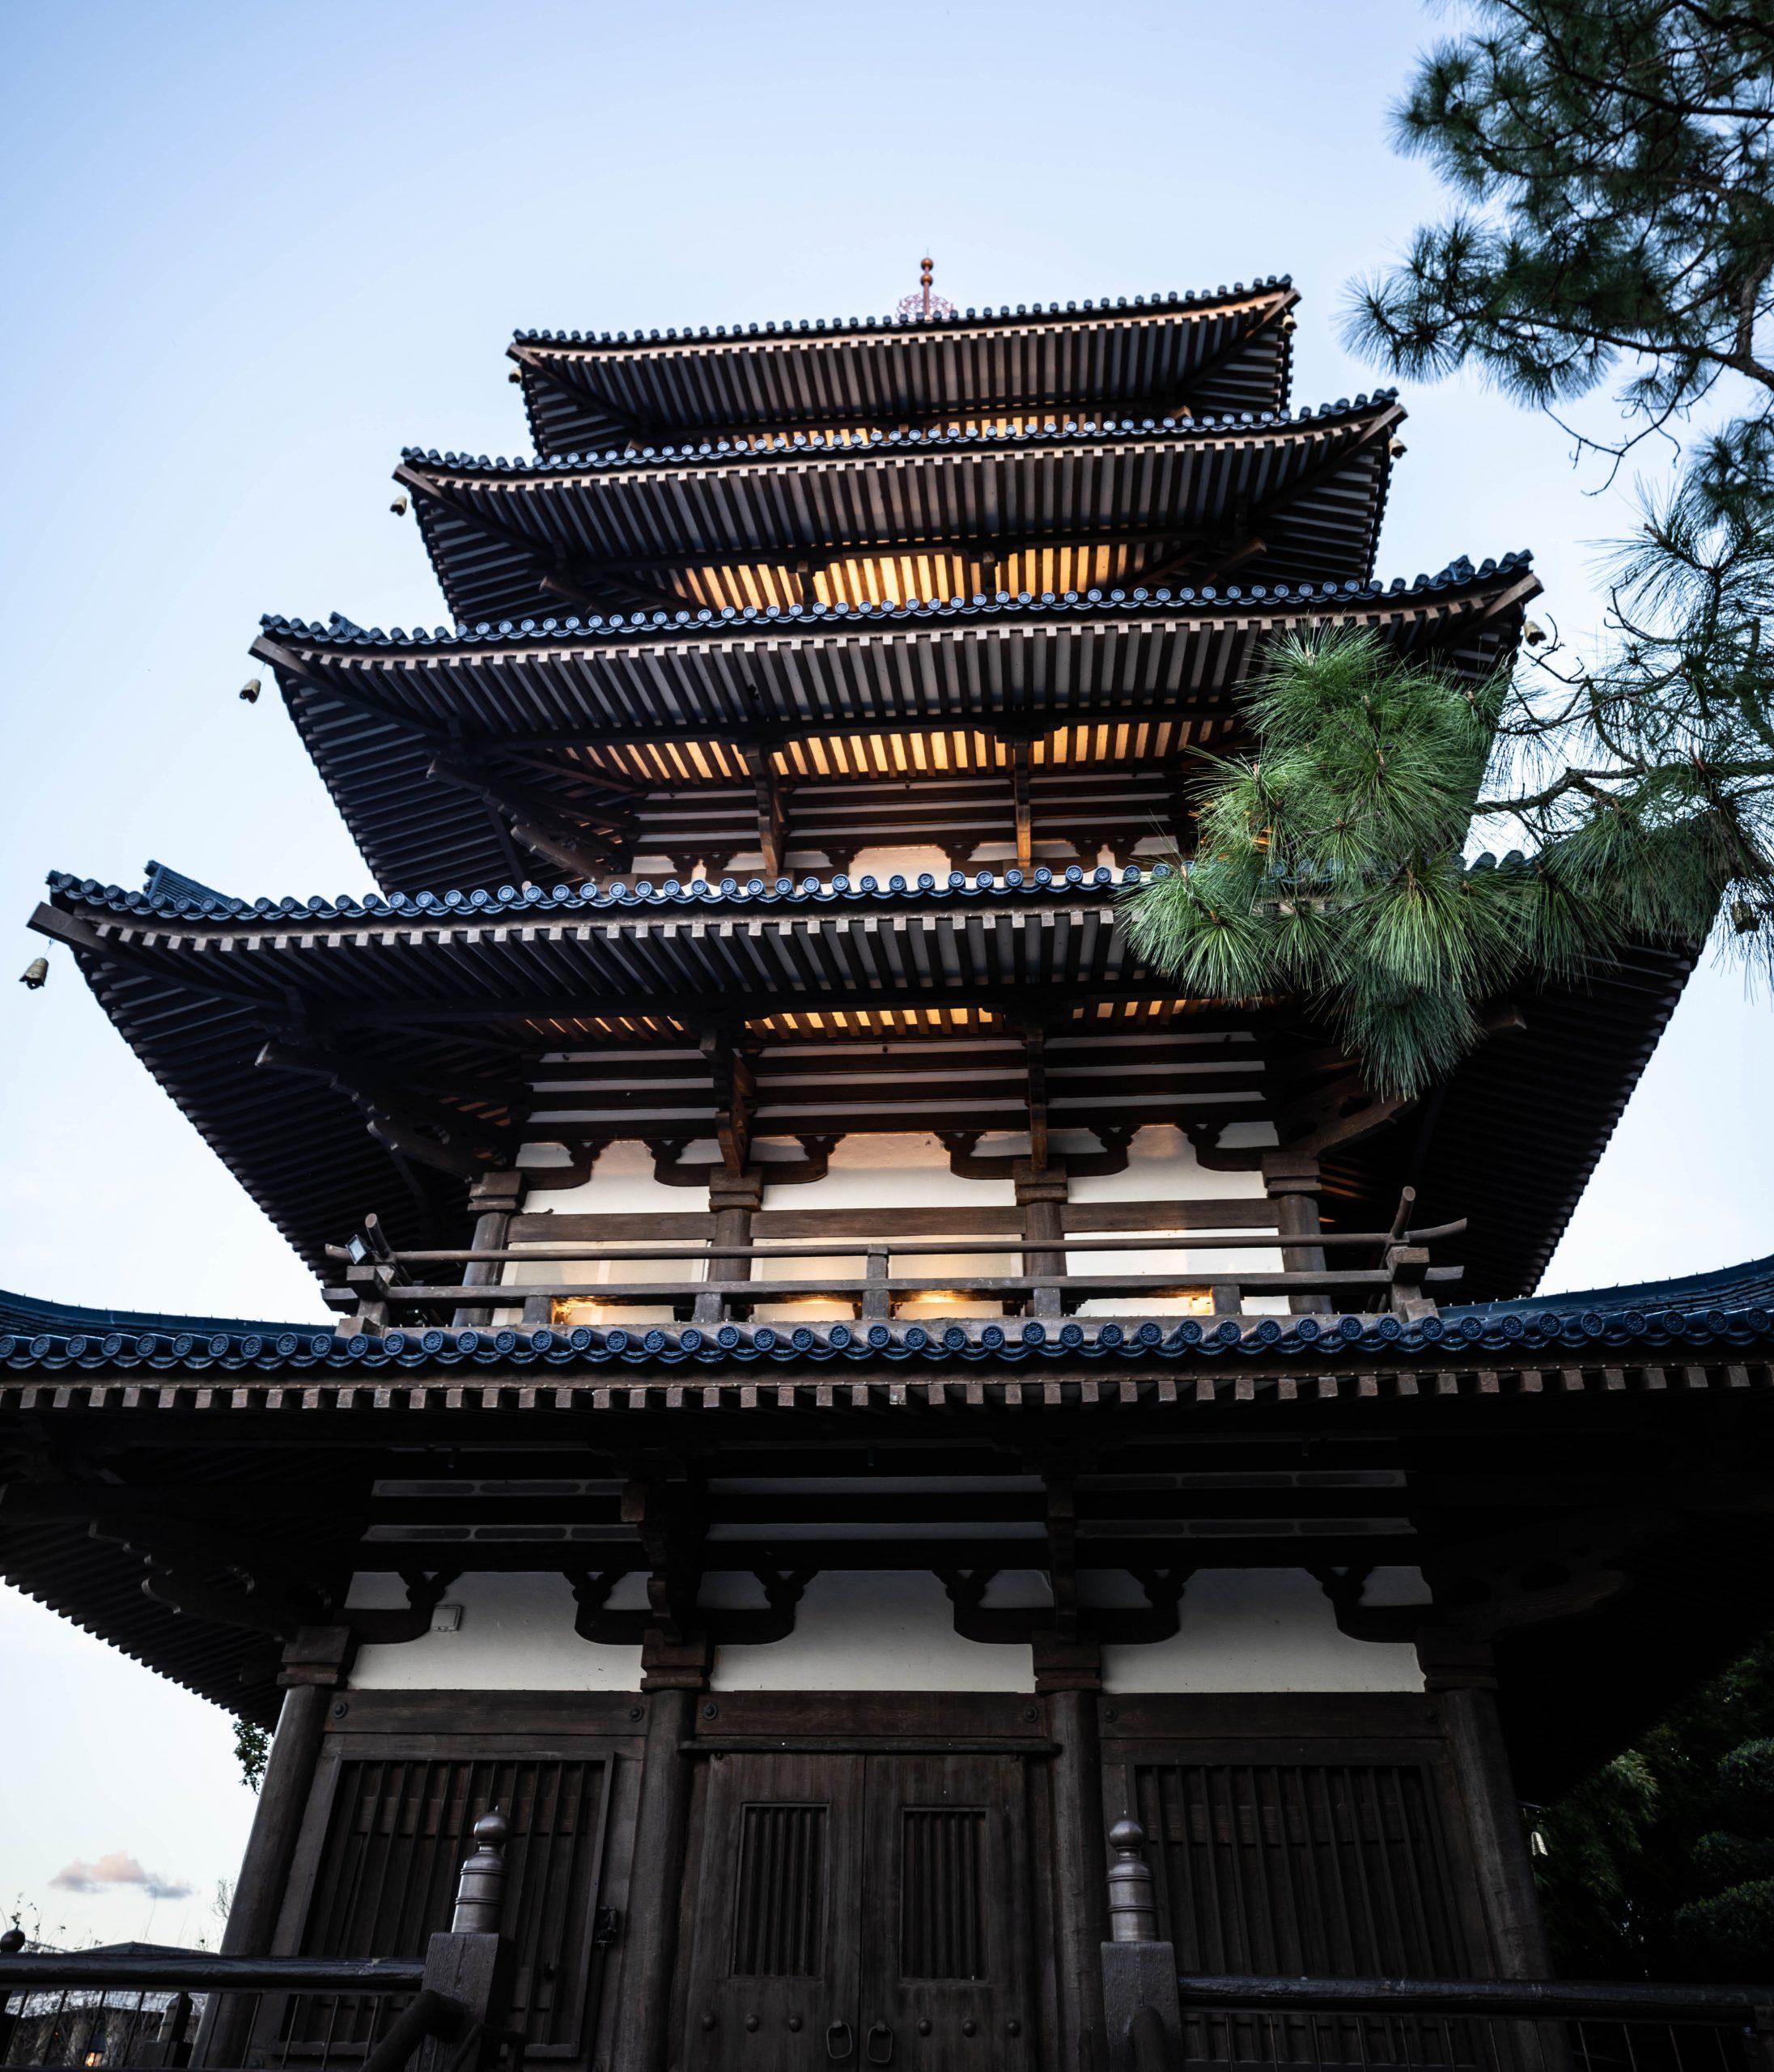 Pagoda Japan Epcot Walt Disney World by Luxury Travel Writer and Photographer Annie Fairfax